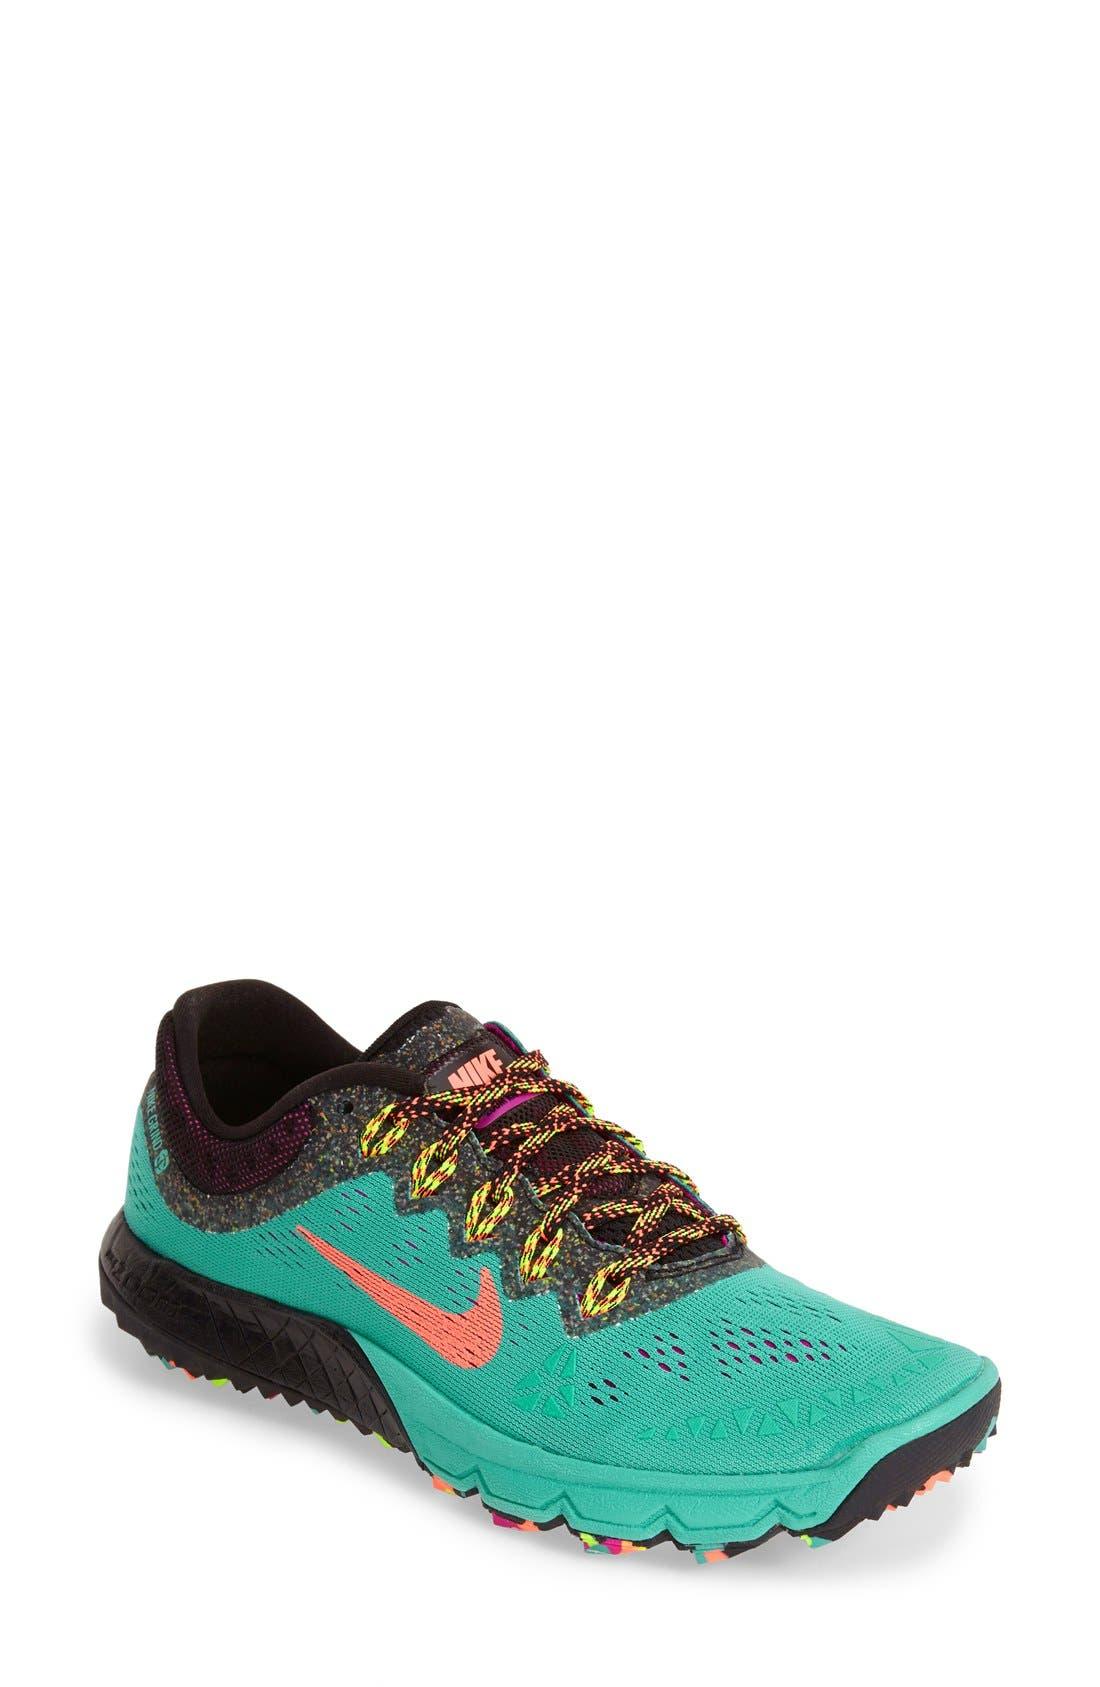 Main Image - Nike 'Zoom Terra Kiger' Trail Running Shoe (Women)